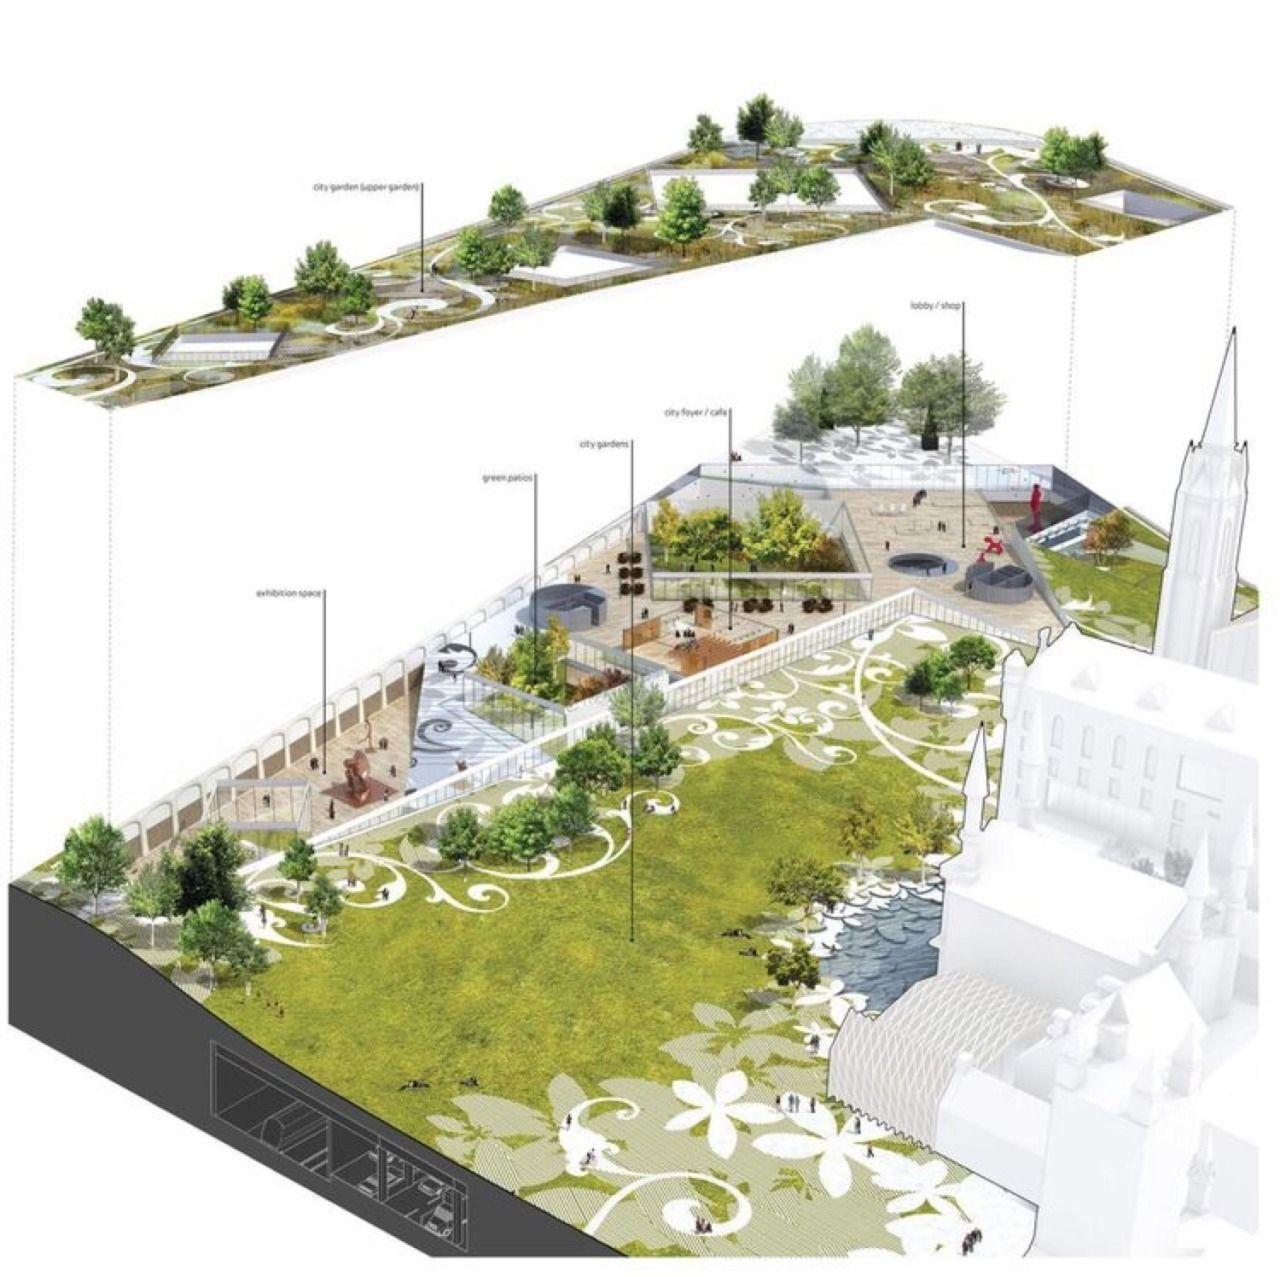 LANDSCAPE ARCHITECTURE Photo Landscape and urbanism